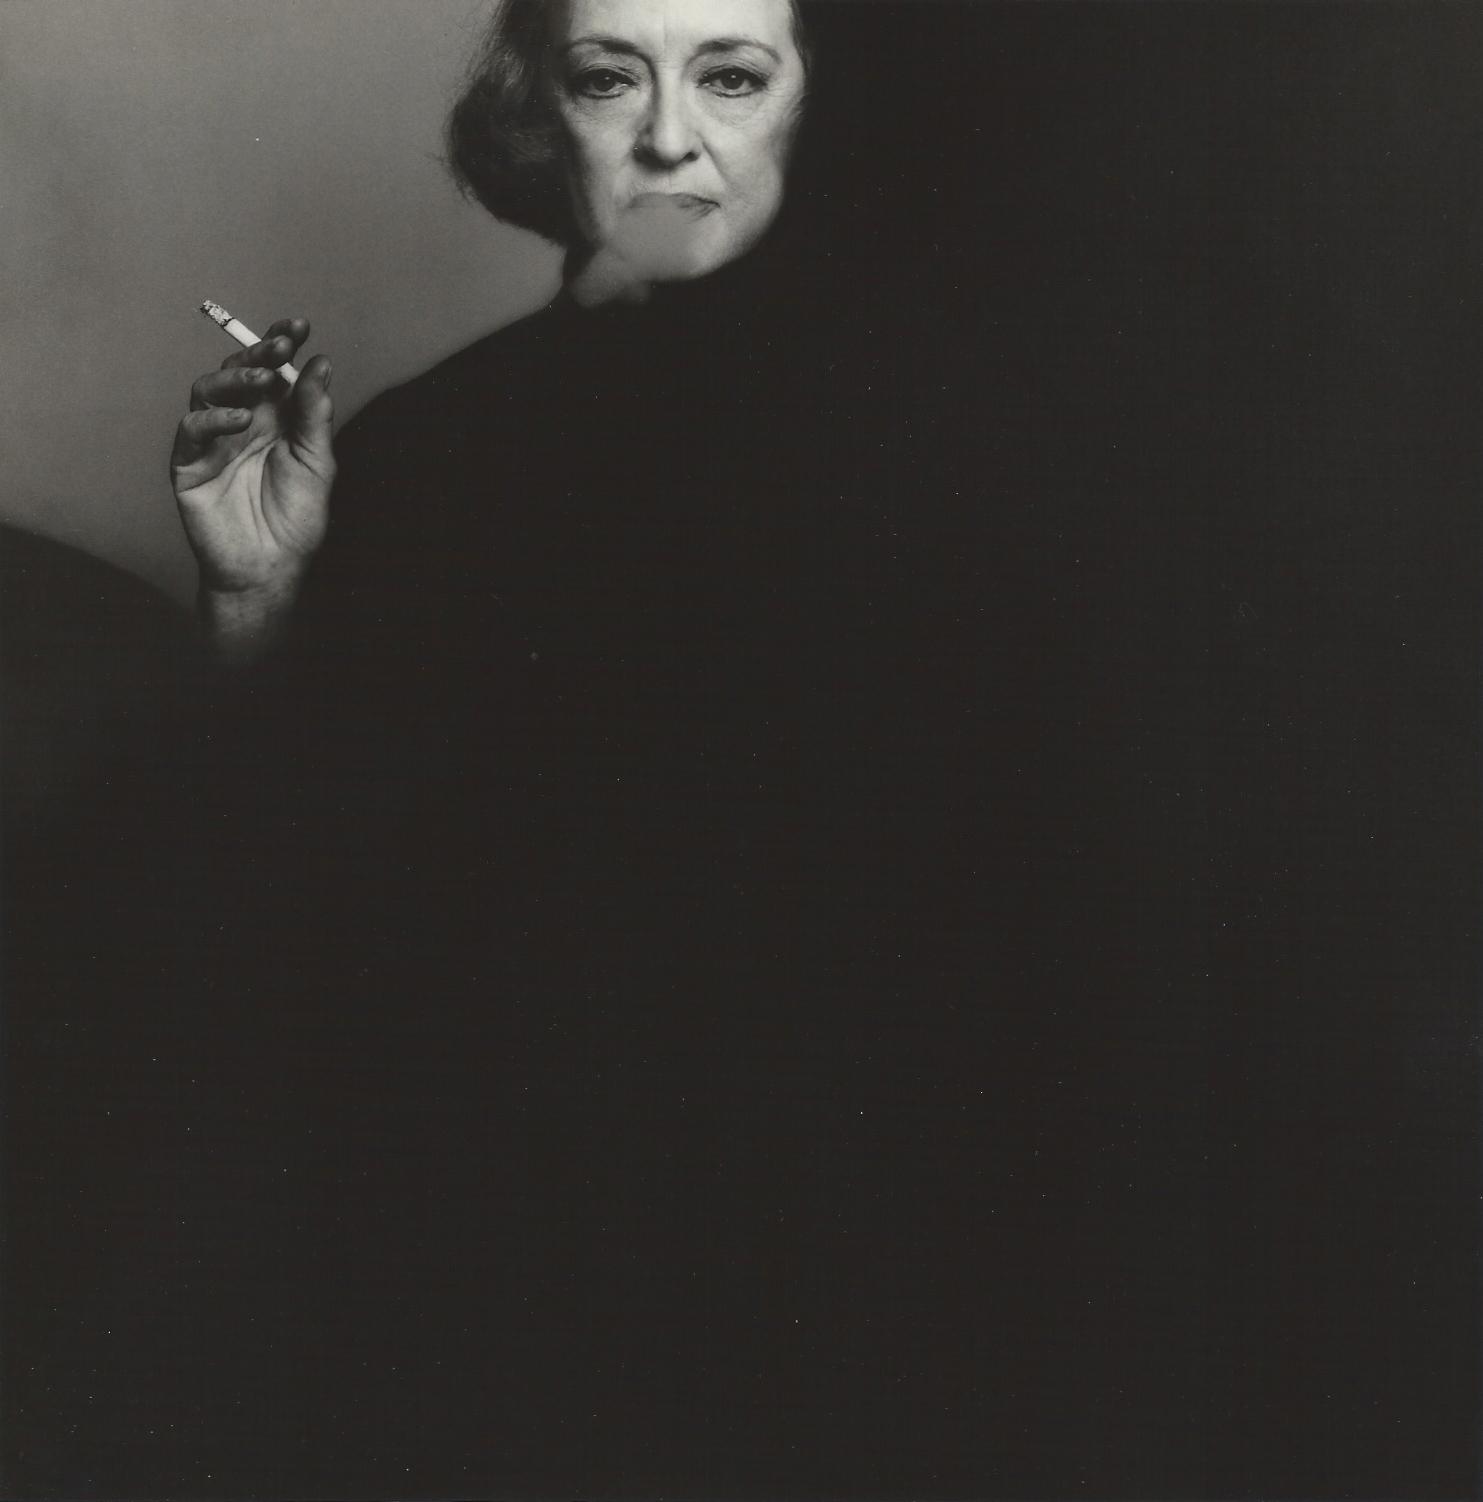 Victor   Skrebneski  ,  Bette Davis, Actor, 08 November 1971, Los Angeles Studio